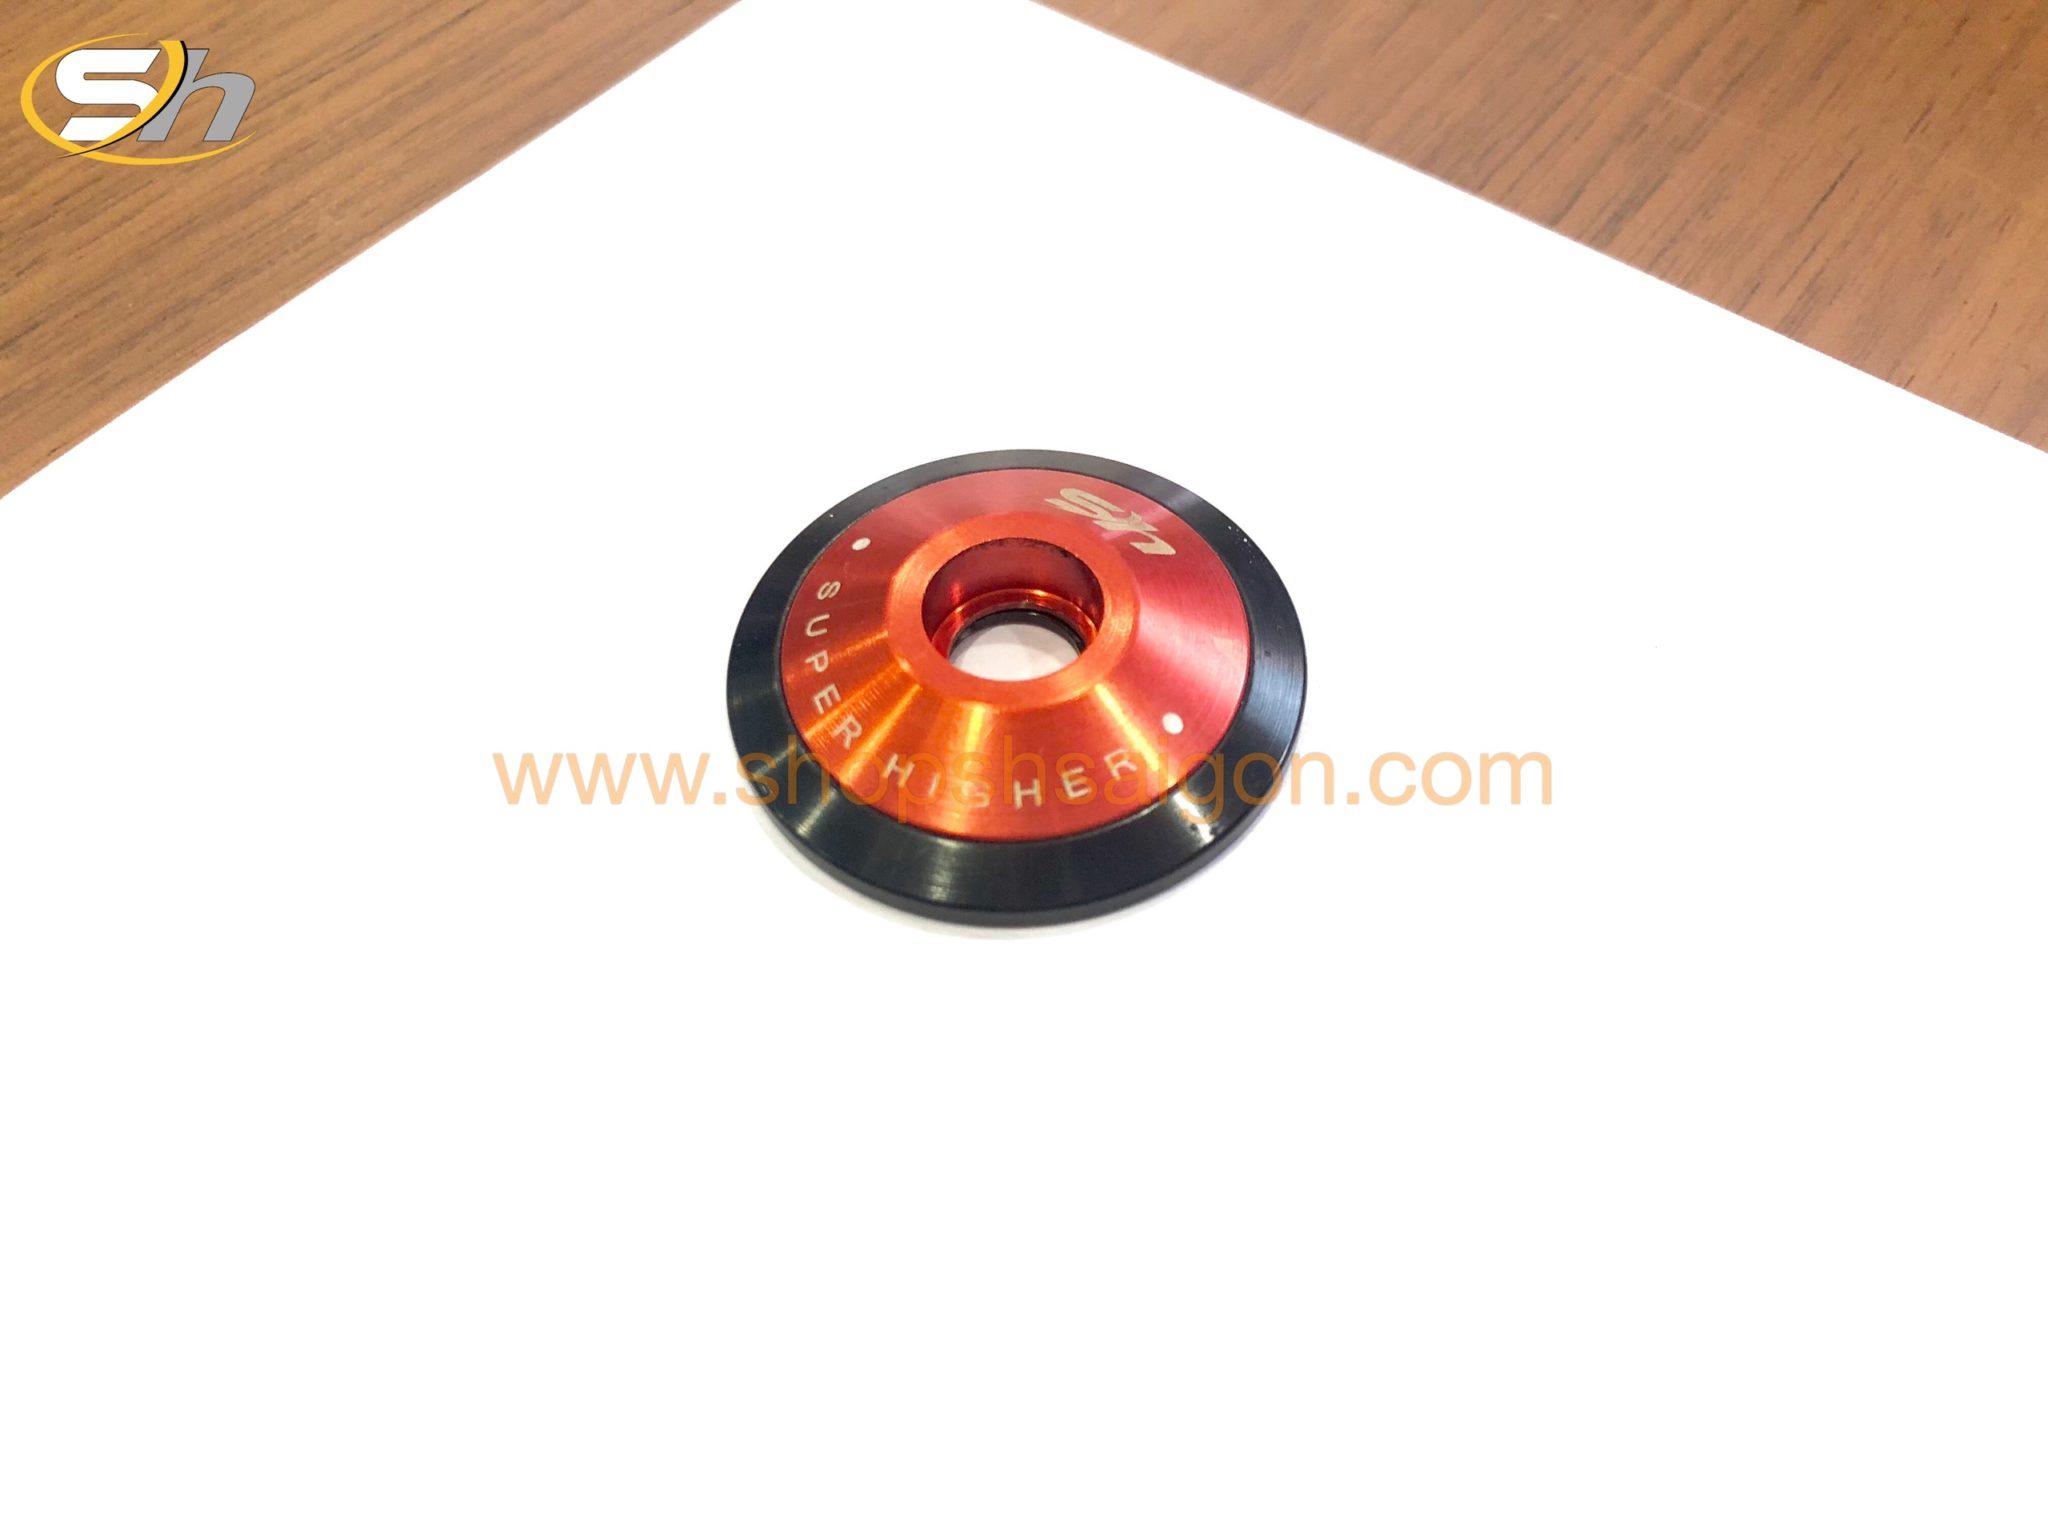 shopshsaigon com bit guong 2 lop super higher 6 - Nút Bịt Gương 2 Lớp Cao Cấp Super Higher